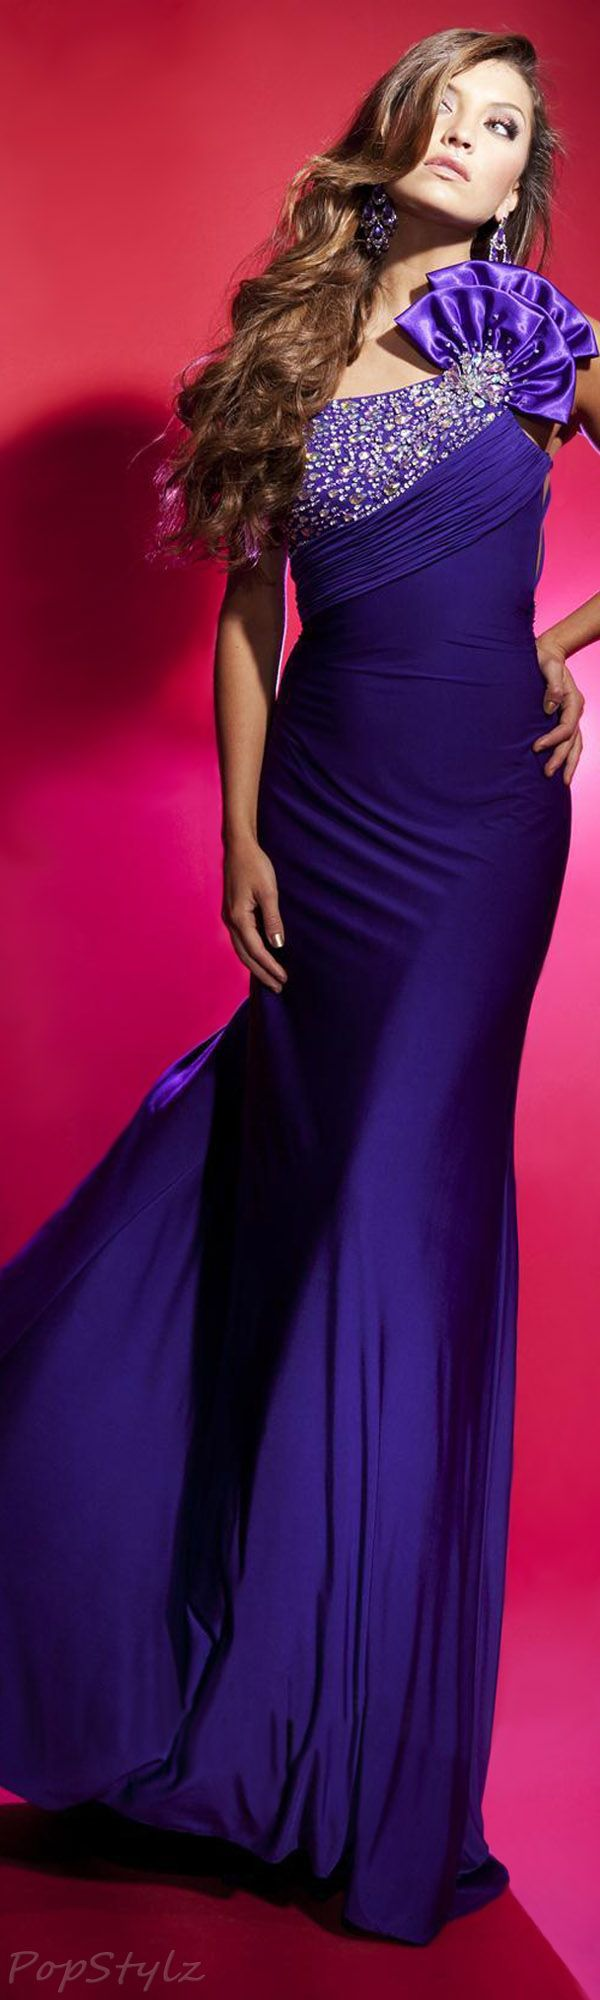 Best 10+ Purple evening gowns ideas on Pinterest | Purple gowns ...